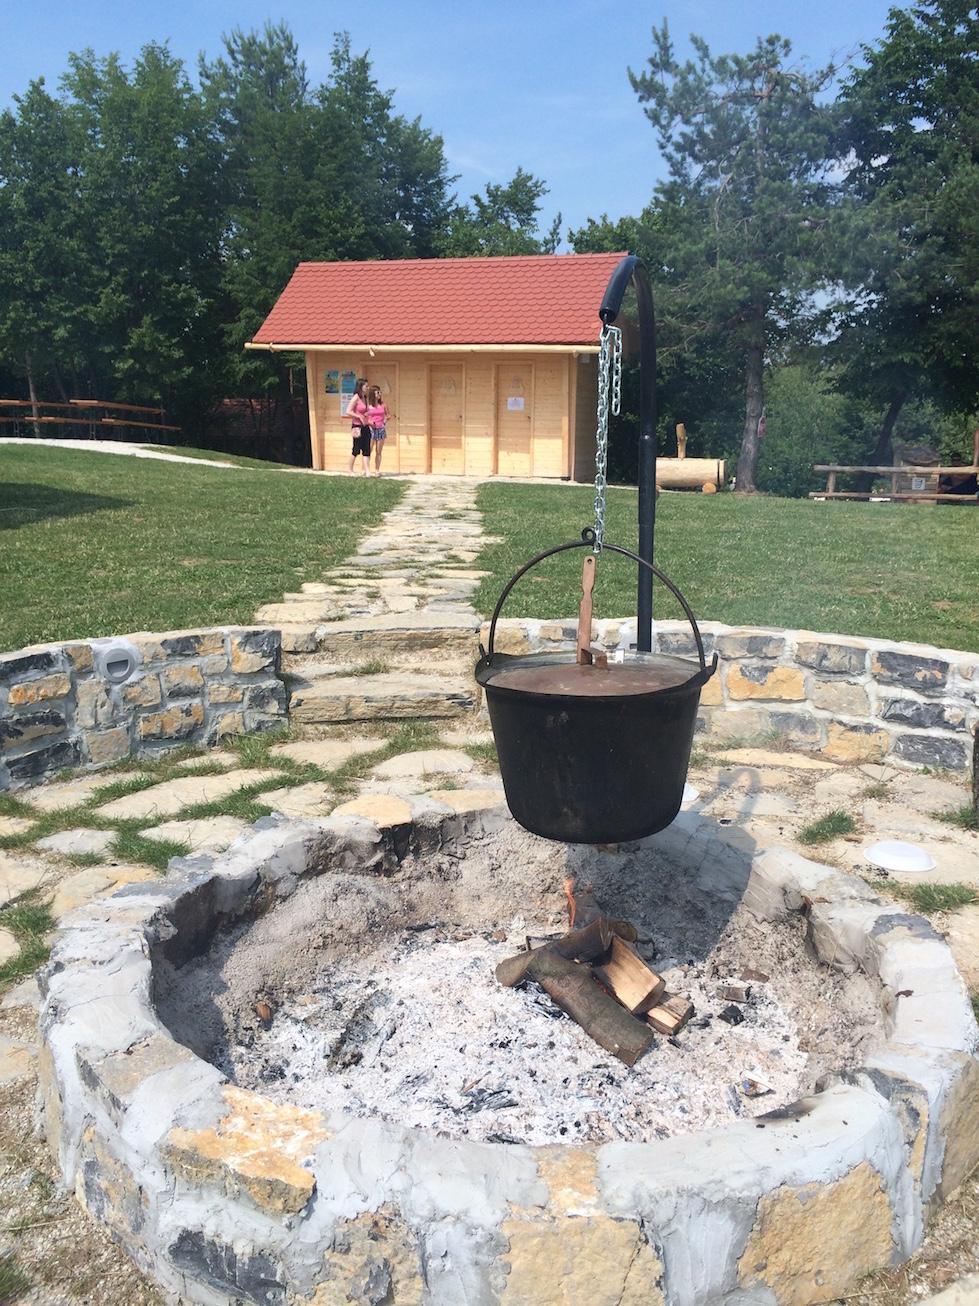 Stew on campfire